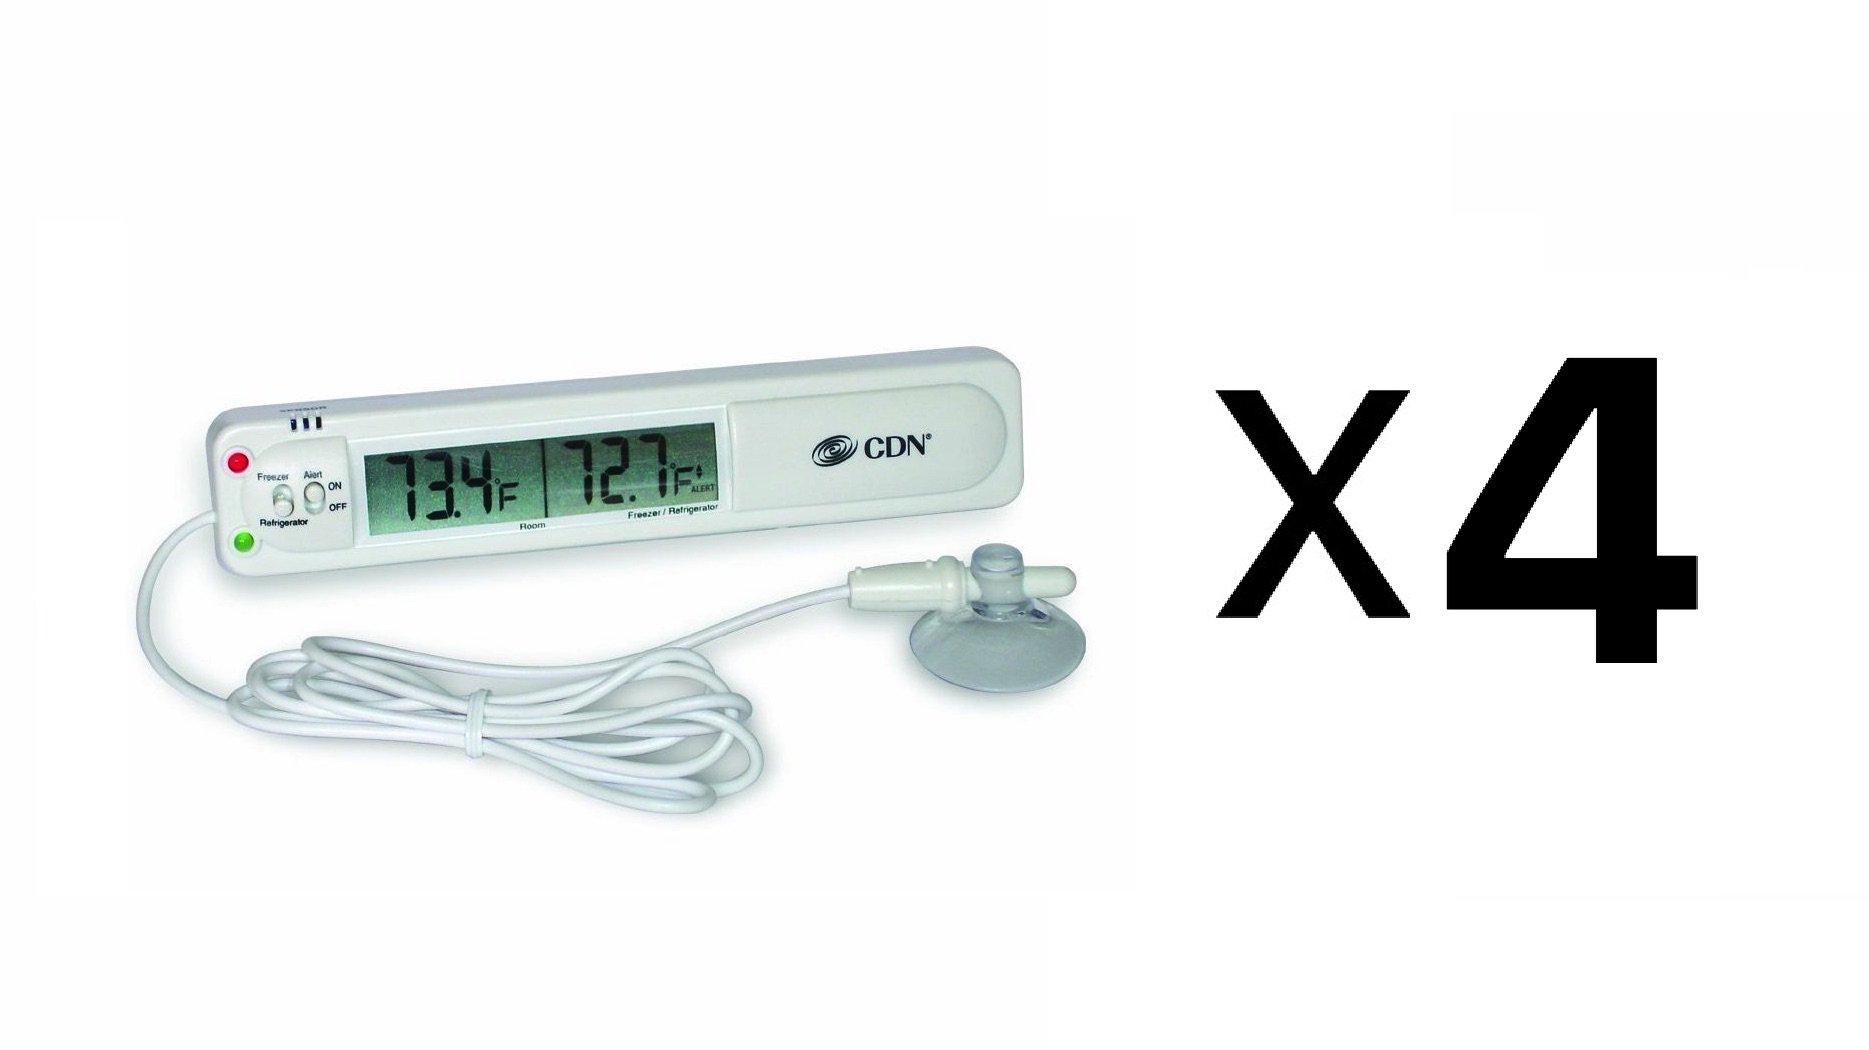 CDN Audio Visual Refrigerator Freezer Alarm Thermometer Temperature (4-Pack) by CDN